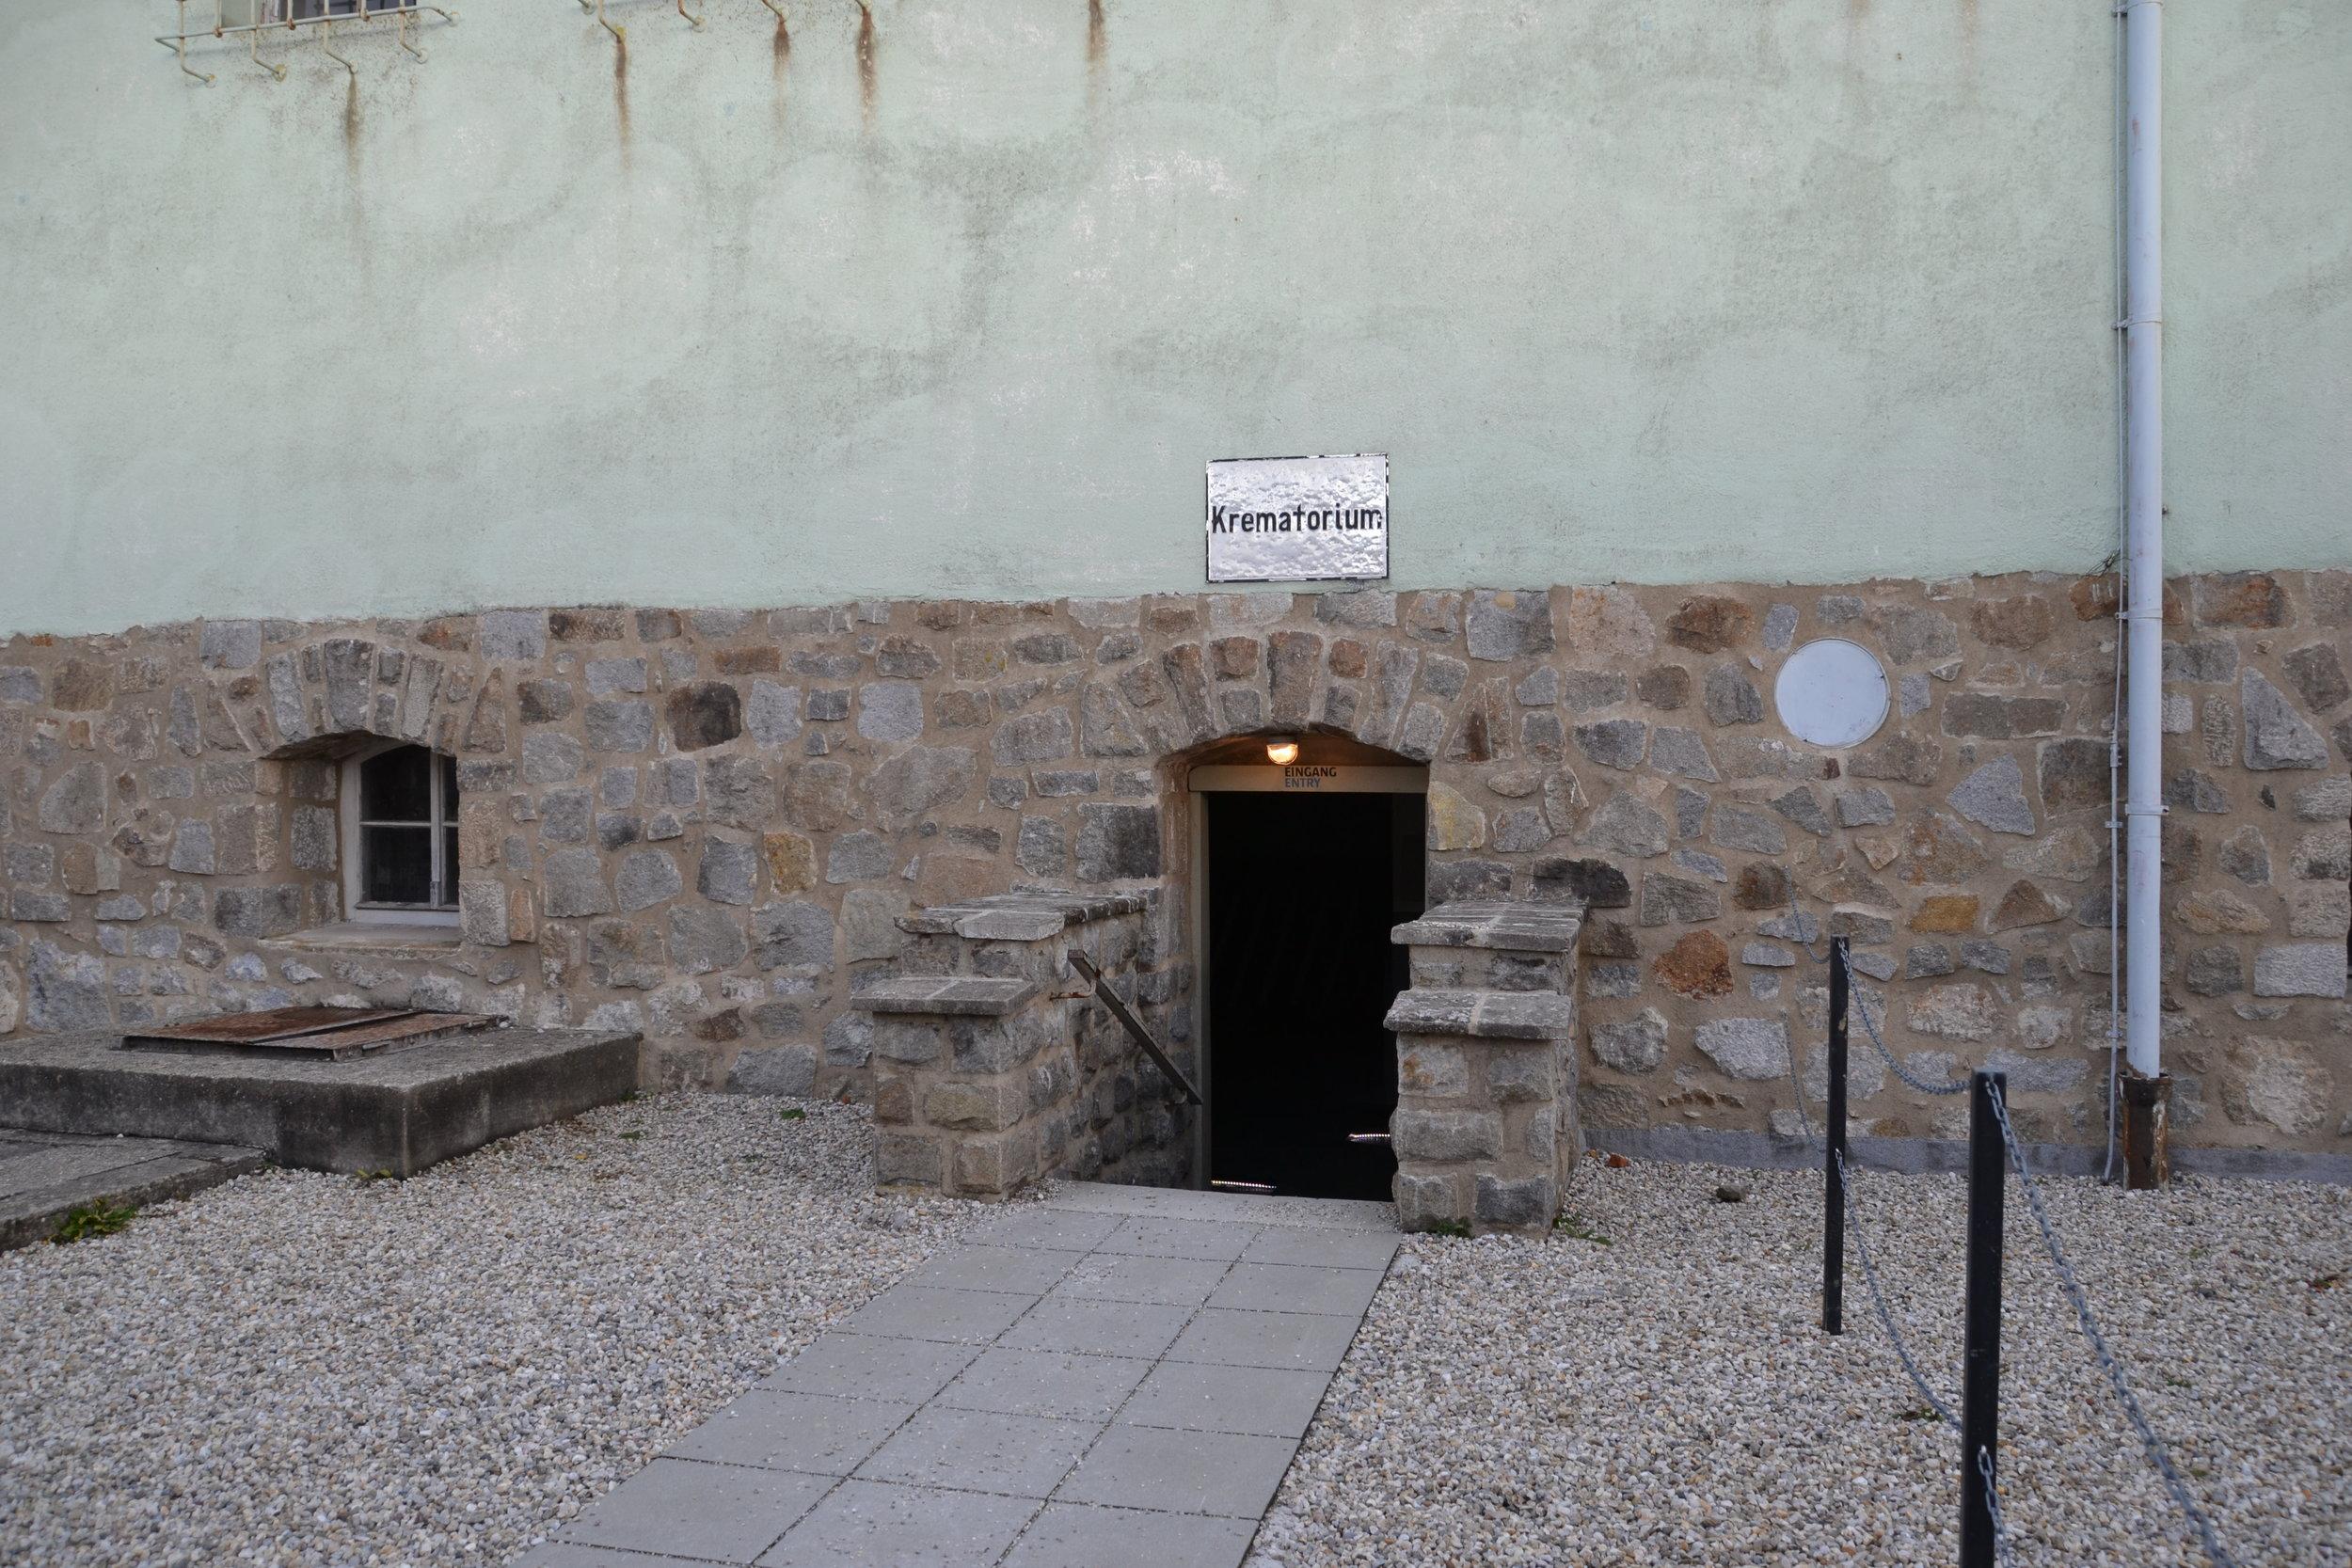 Krematorium Entrance